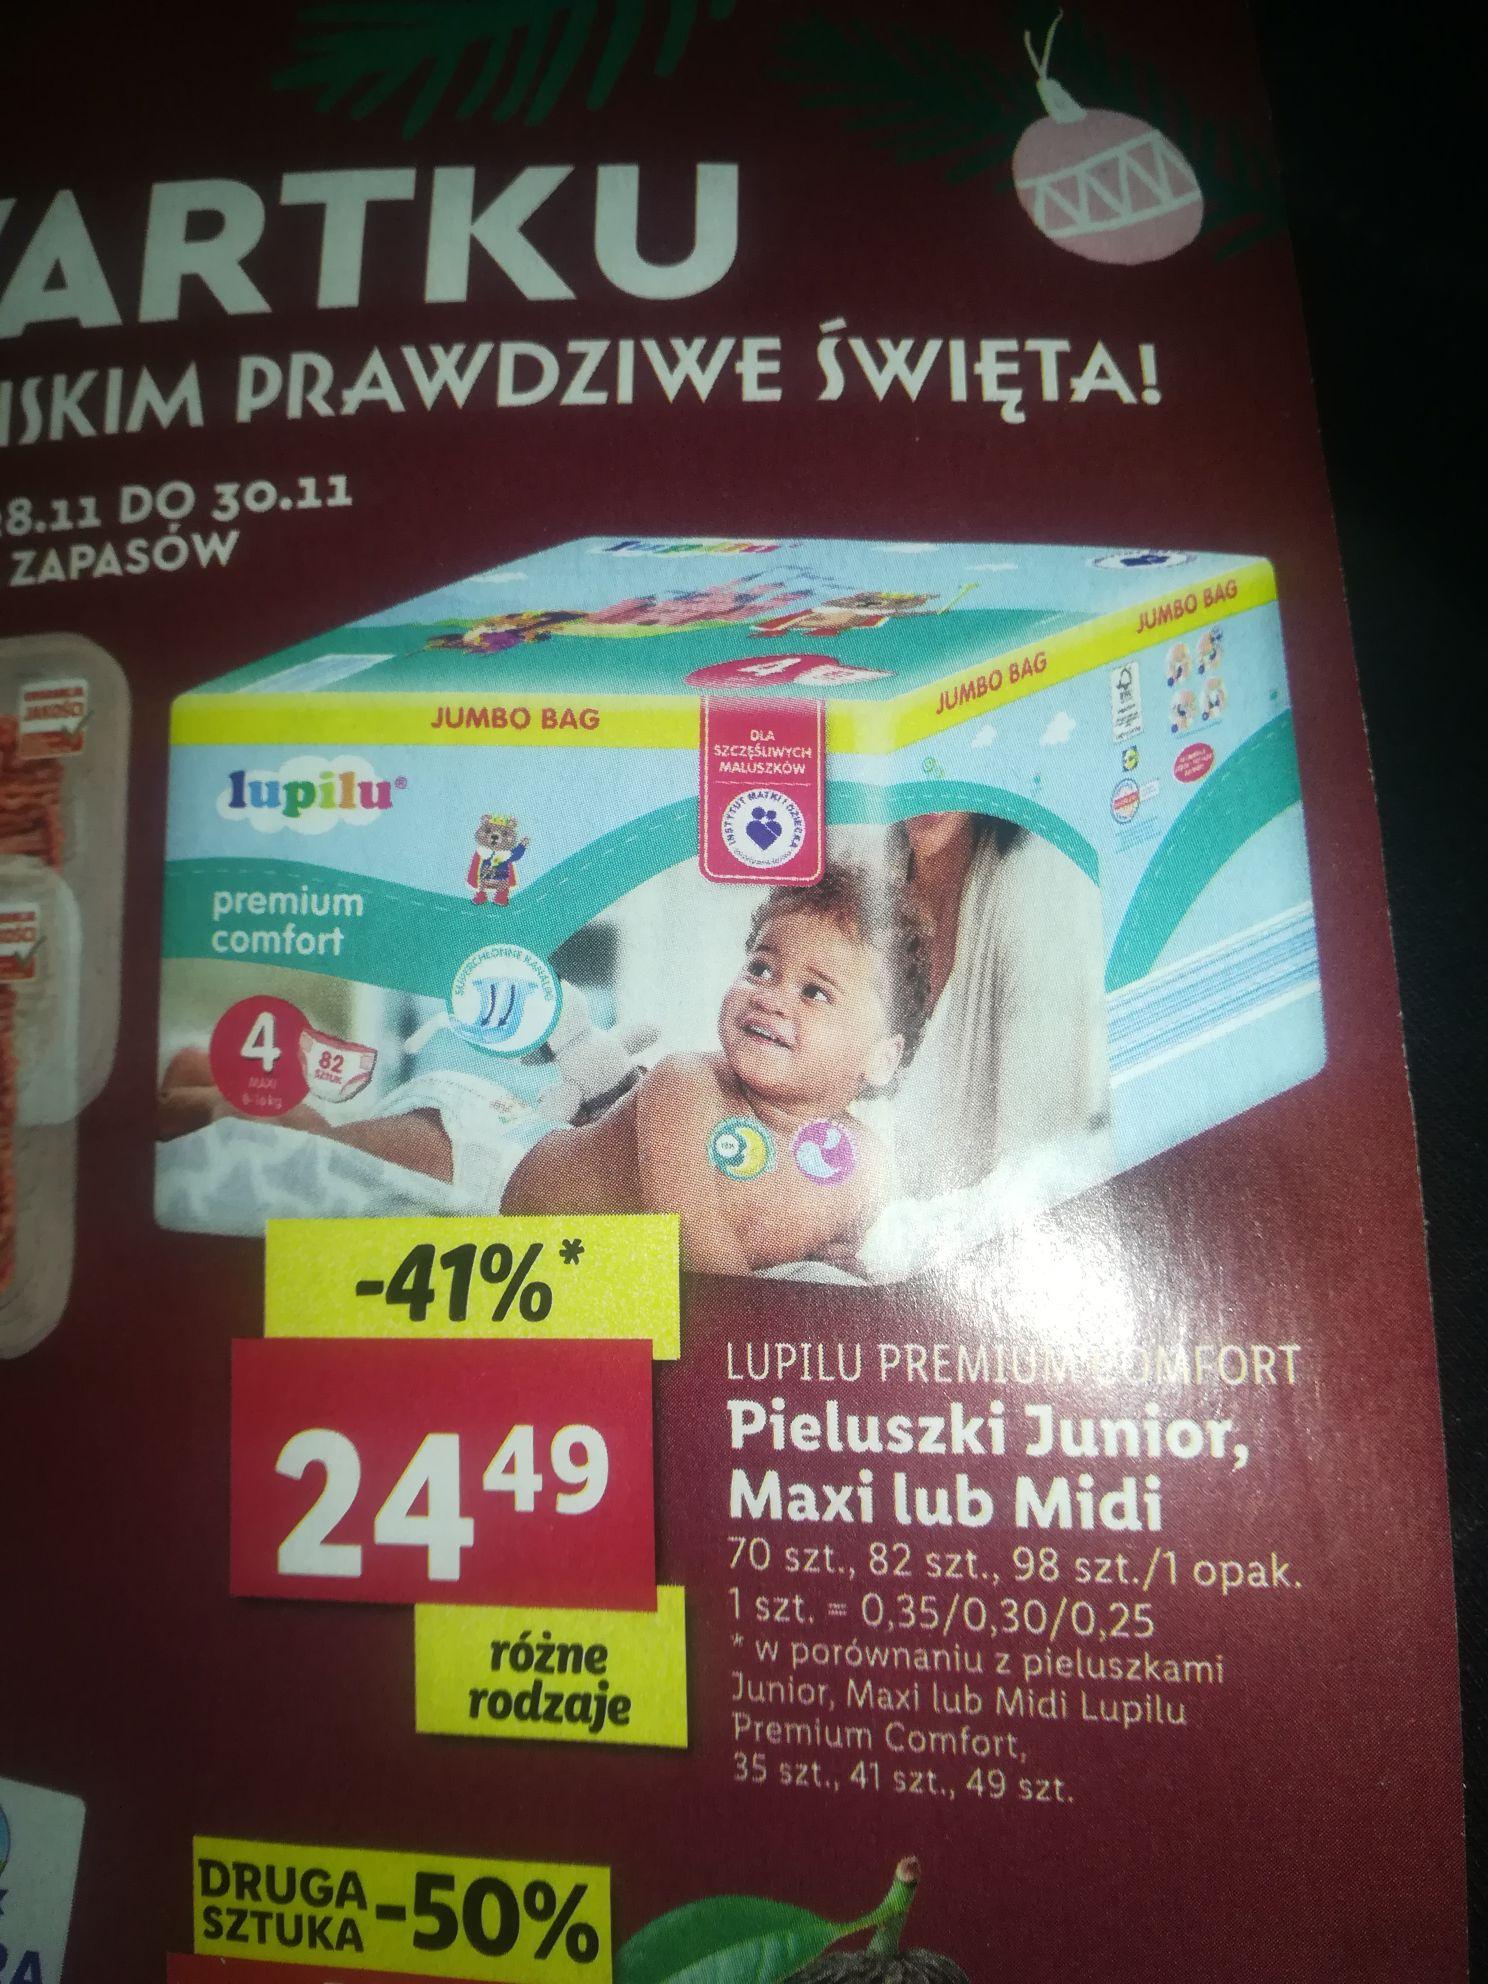 Pieluchy Lupilu Premium Comfort Lidl Jumbo Bag od 28.11